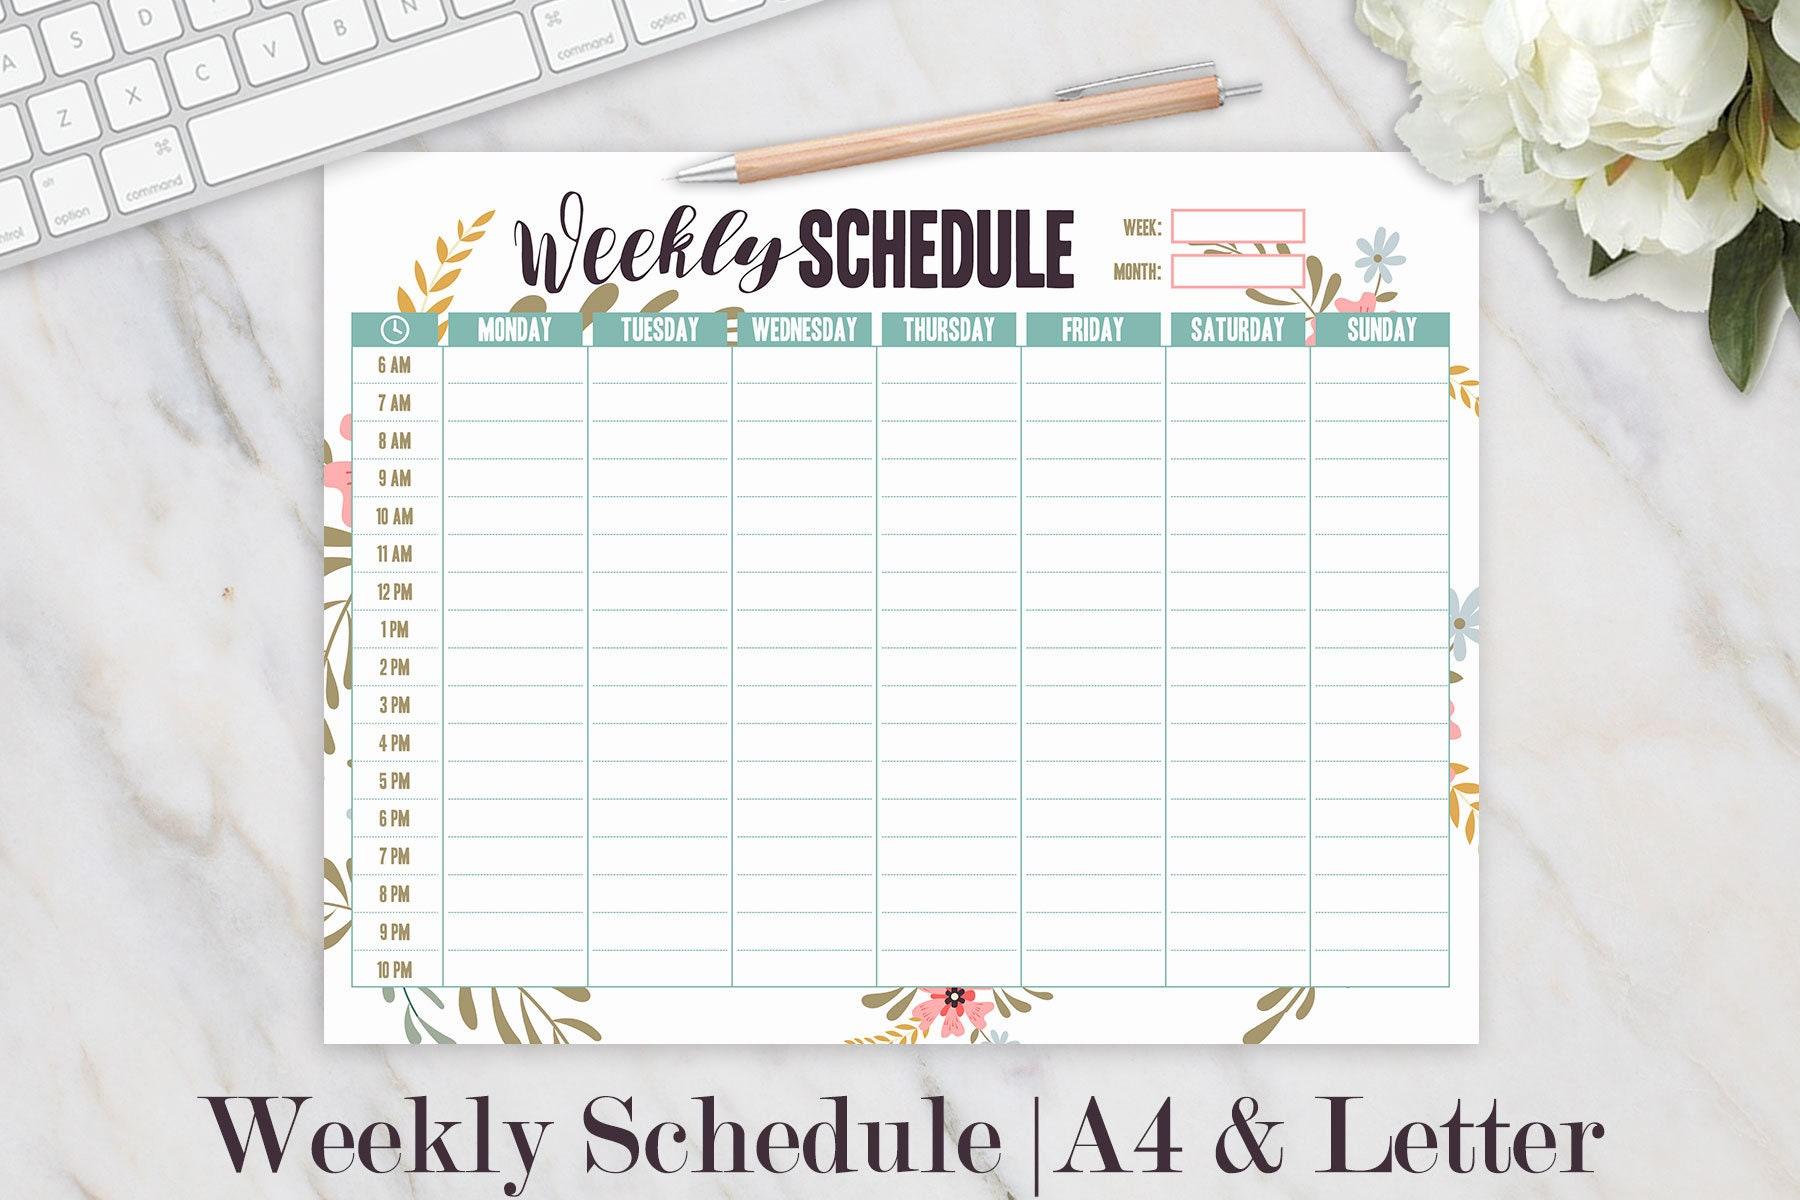 photo regarding Printable Hourly Planner identified as Weekly Agenda Printable, Scholar Hourly Planner, Weekly Organizer, Weekly Printable, Day-to-day Program, Homeschool Planner, Spouse and children Planner